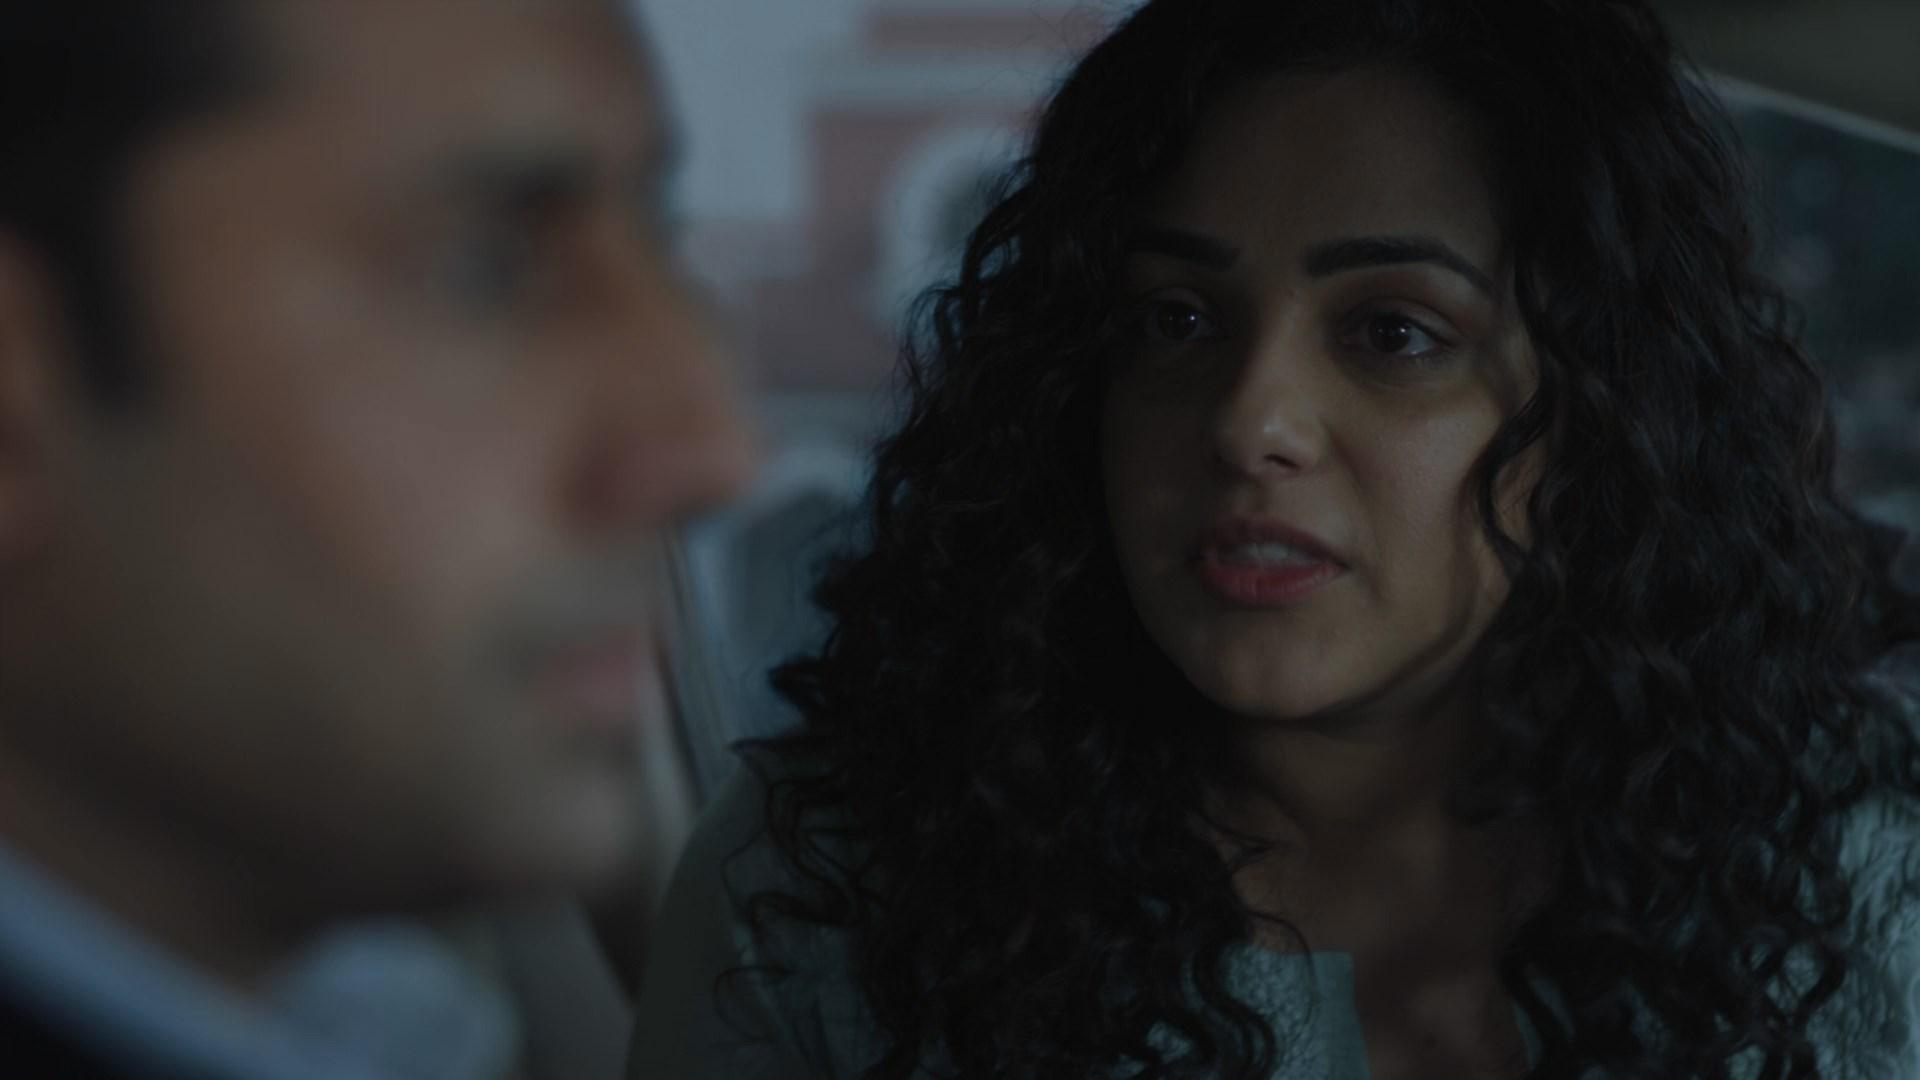 Download Breathe: Into the Shadows 2020 (Season 1) Hindi